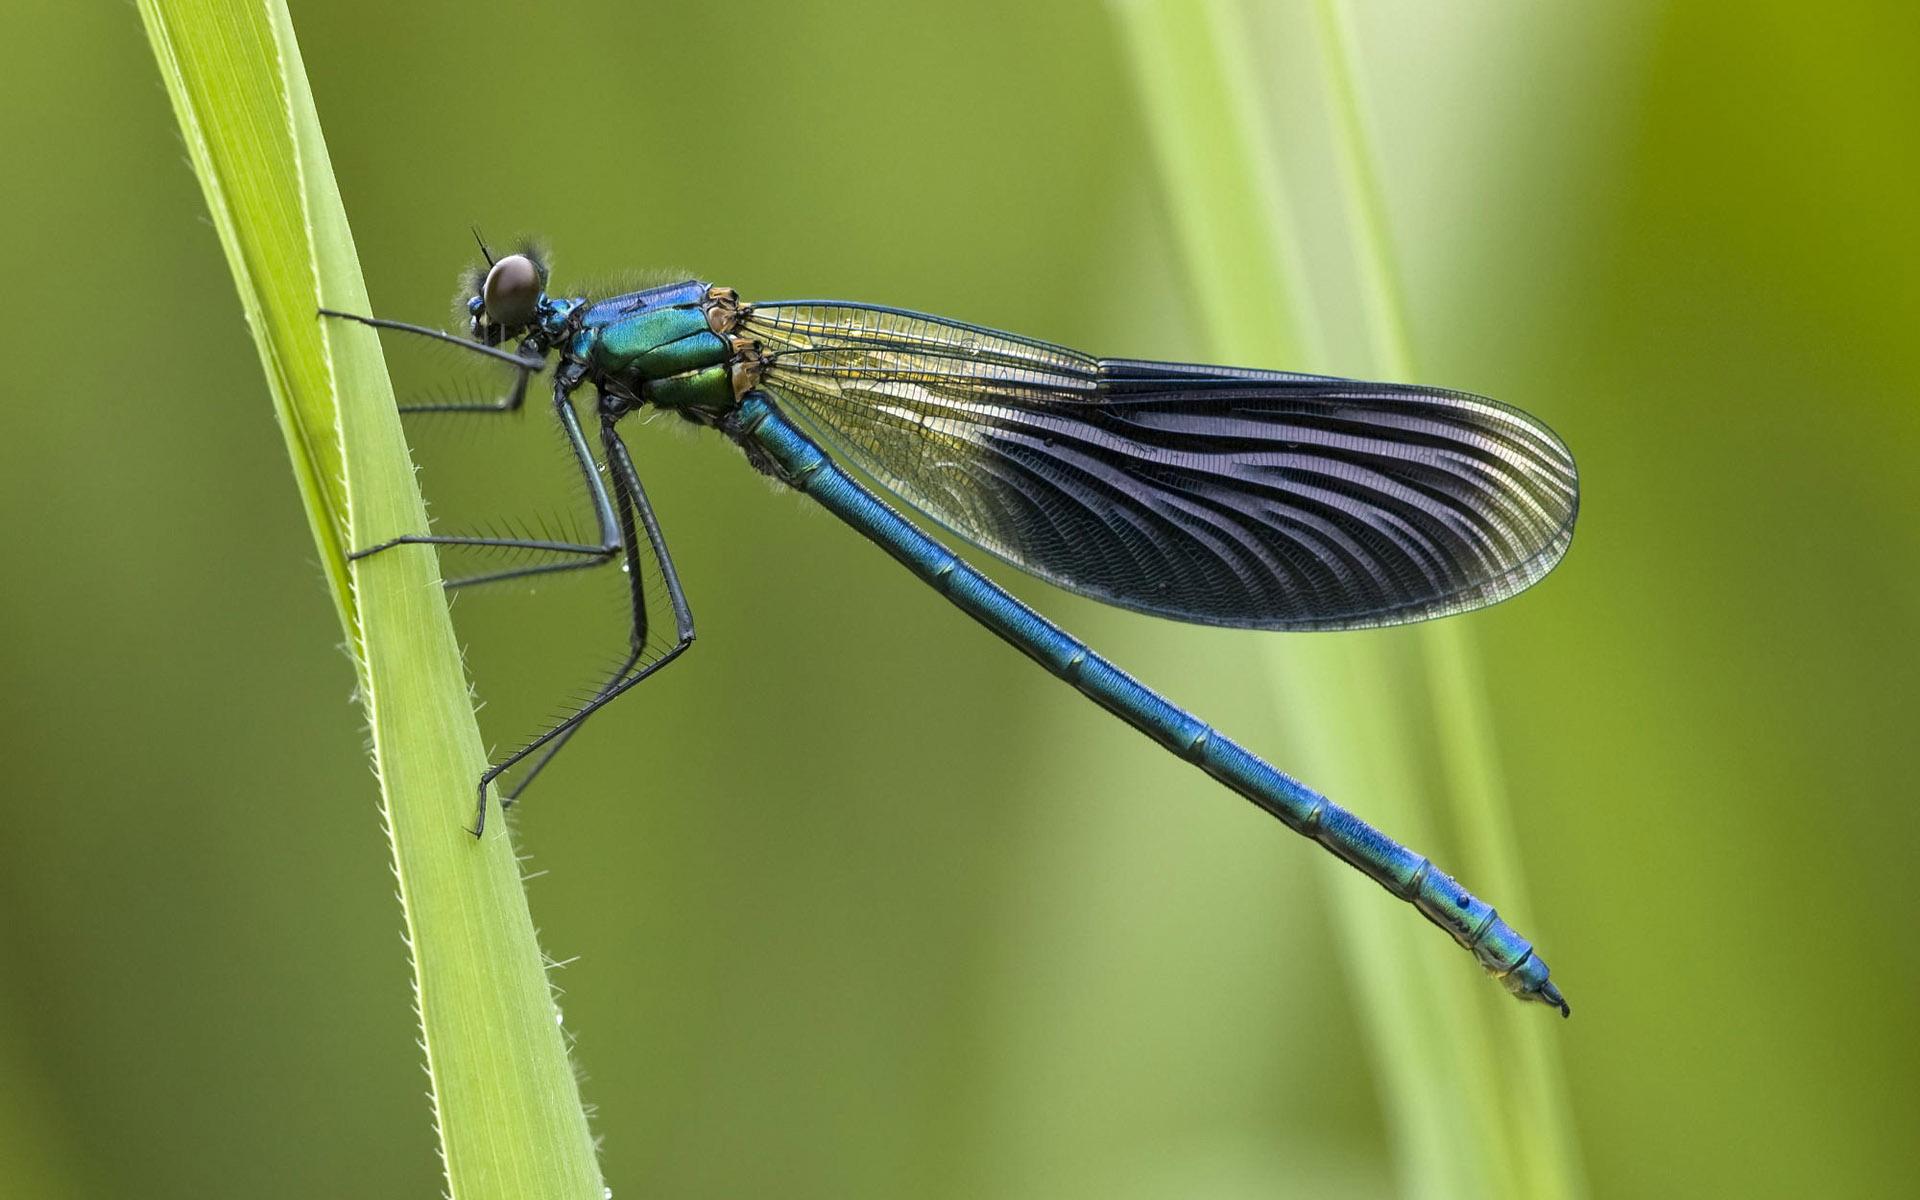 ... Dragonfly Wallpaper; Dragonfly Wallpaper